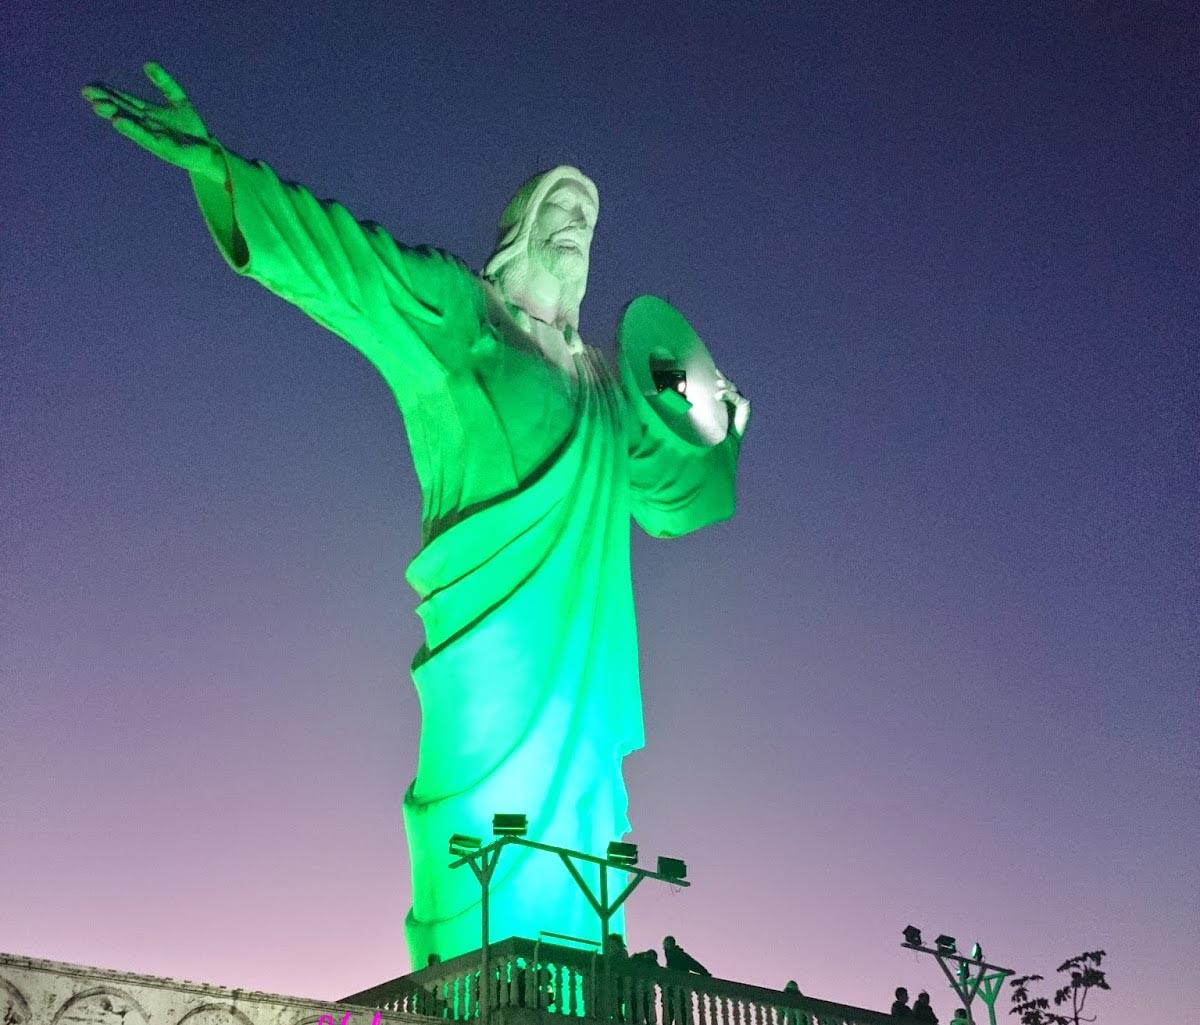 Cristo Luz iluminado